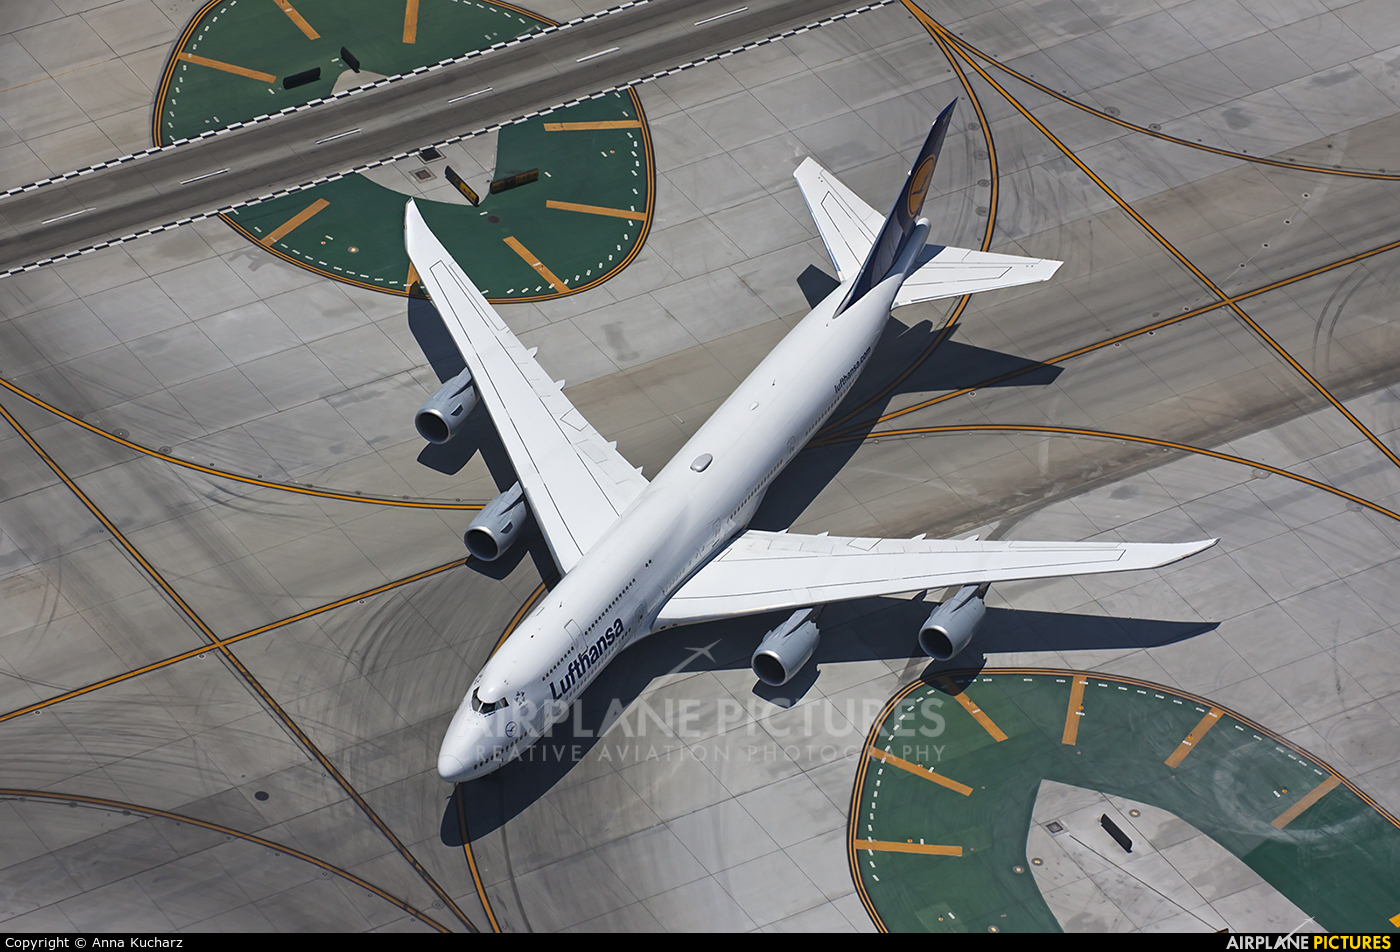 Lufthansa D-ABYF aircraft at Los Angeles Intl